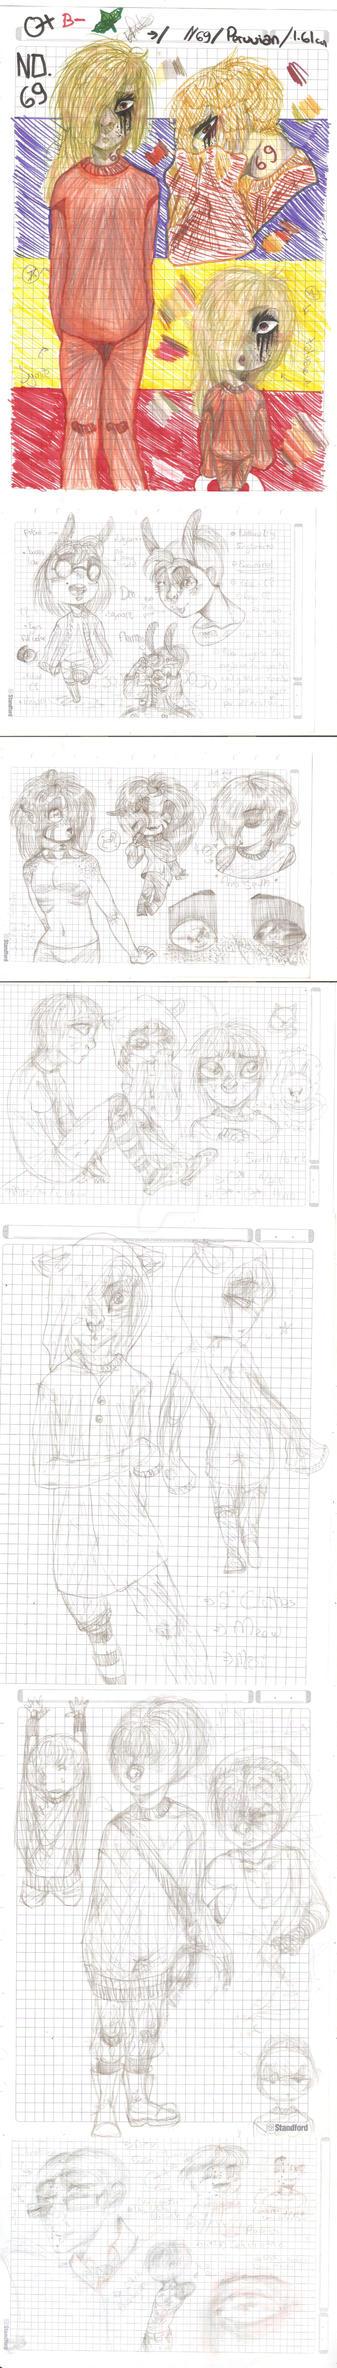 [ Dump Sketch / News Ocs ] by Princess-blackRoses